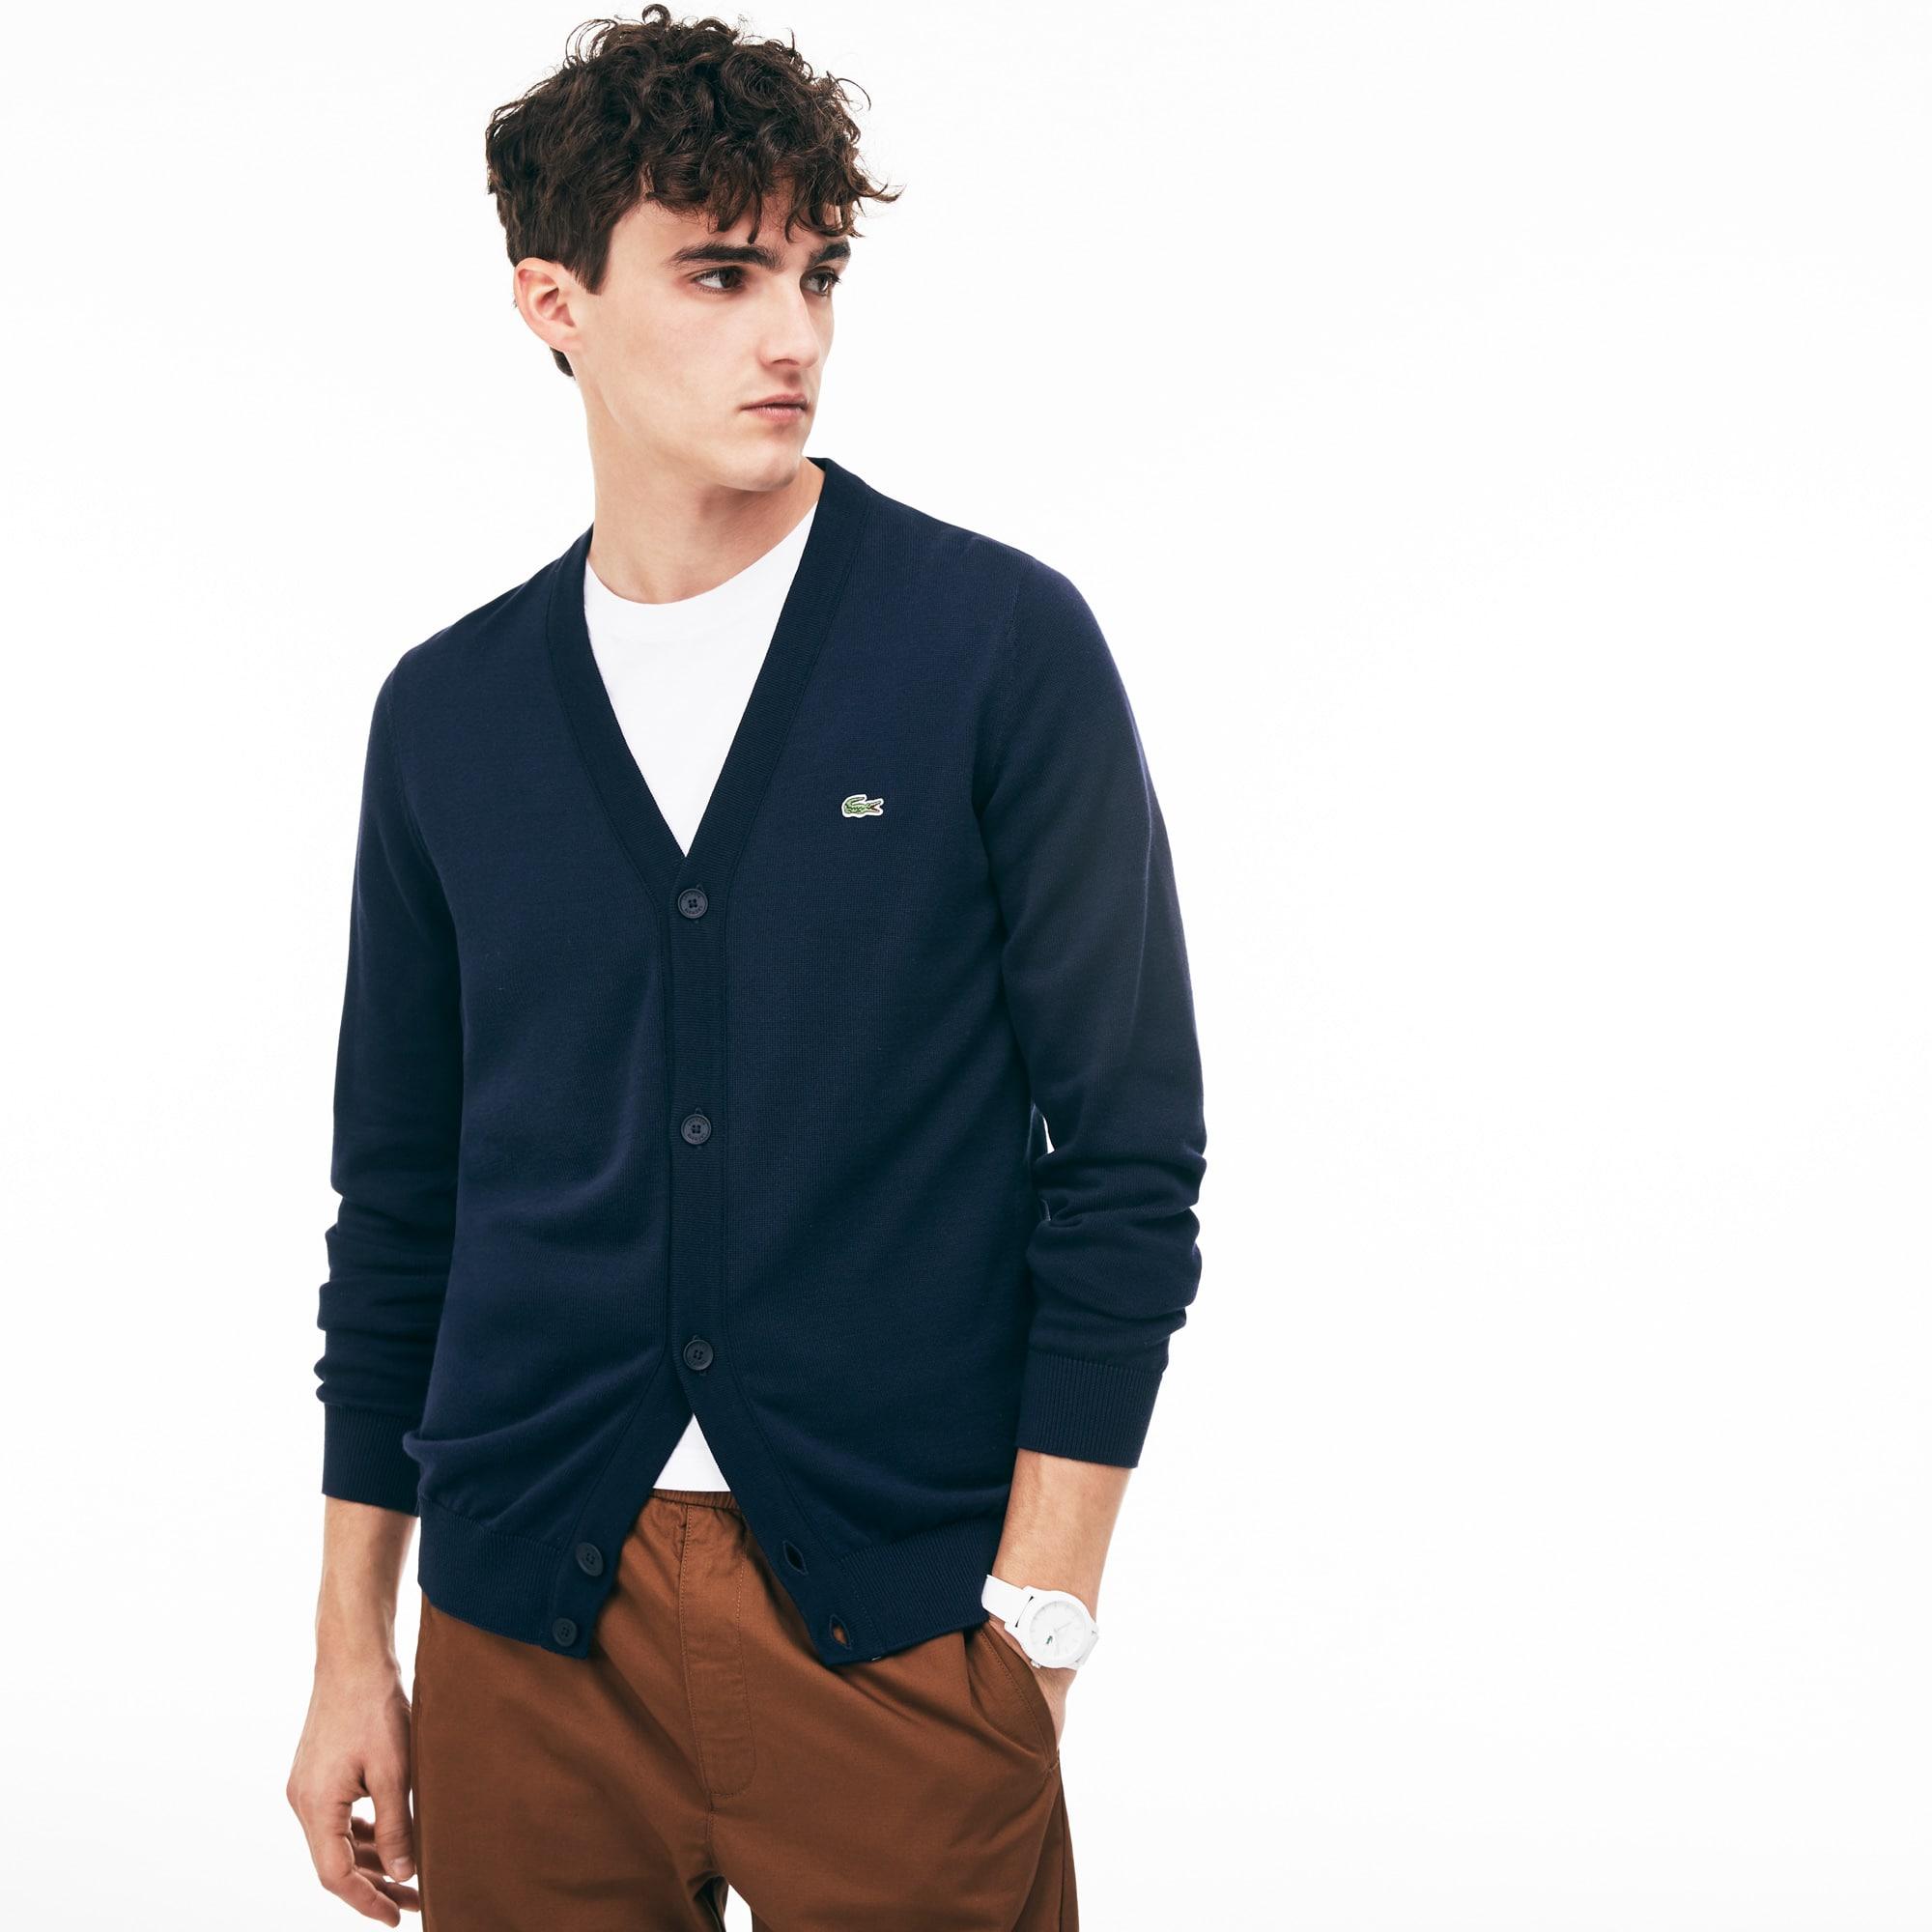 Men's Cotton Jersey Cardigan